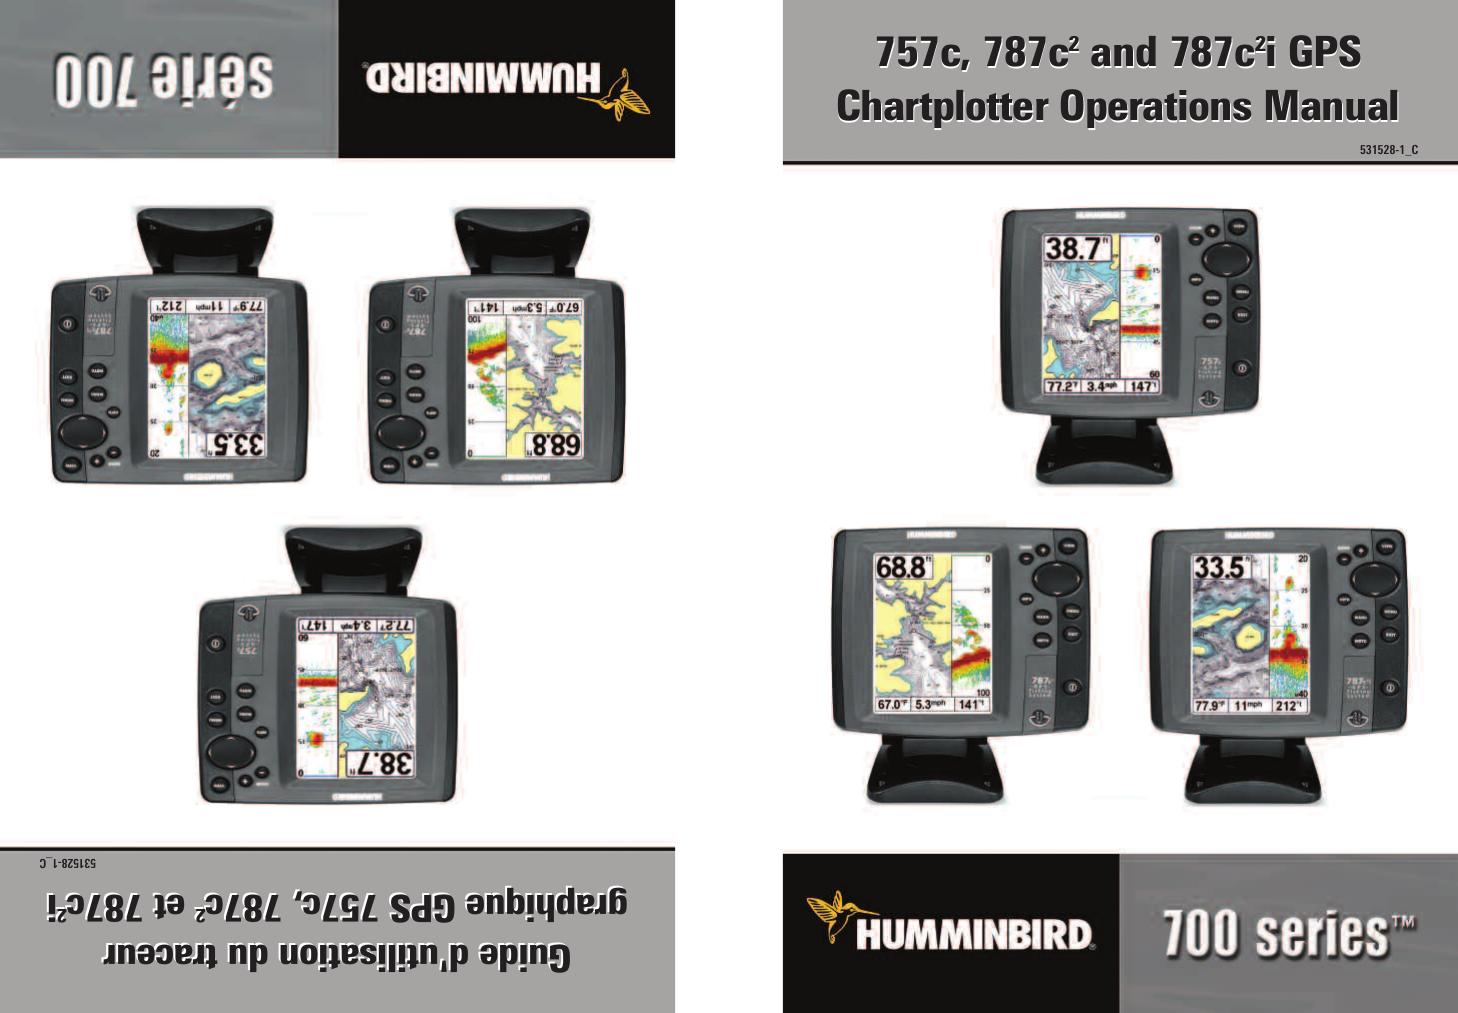 Humminbird 787c2 Users Manual 26561 531476 1 A Eng Nmea 0183 Wiring Diagram